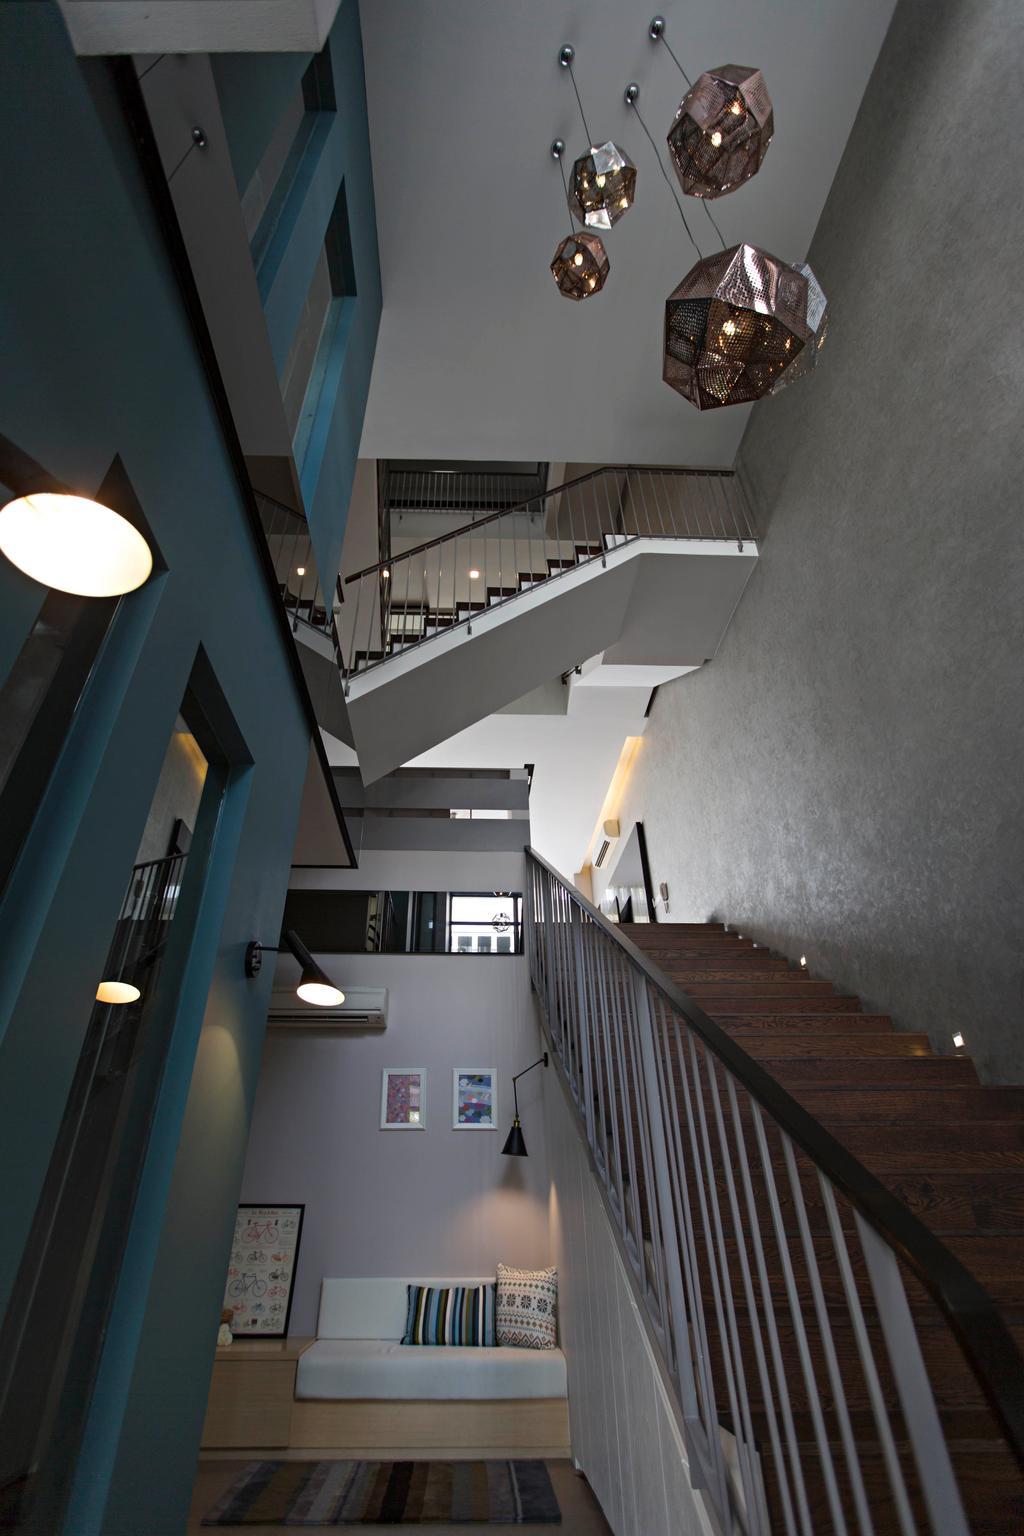 Scandinavian, Landed, The Mansions B, Interior Designer, Turn Design Interior, Staircase, Stairs, Dark, Dark Colours, Dark Walls, Pendant Lighting, Pendant Lamp, Cushion Bench, Small Sofa, Home Decor, Lighting, Banister, Handrail